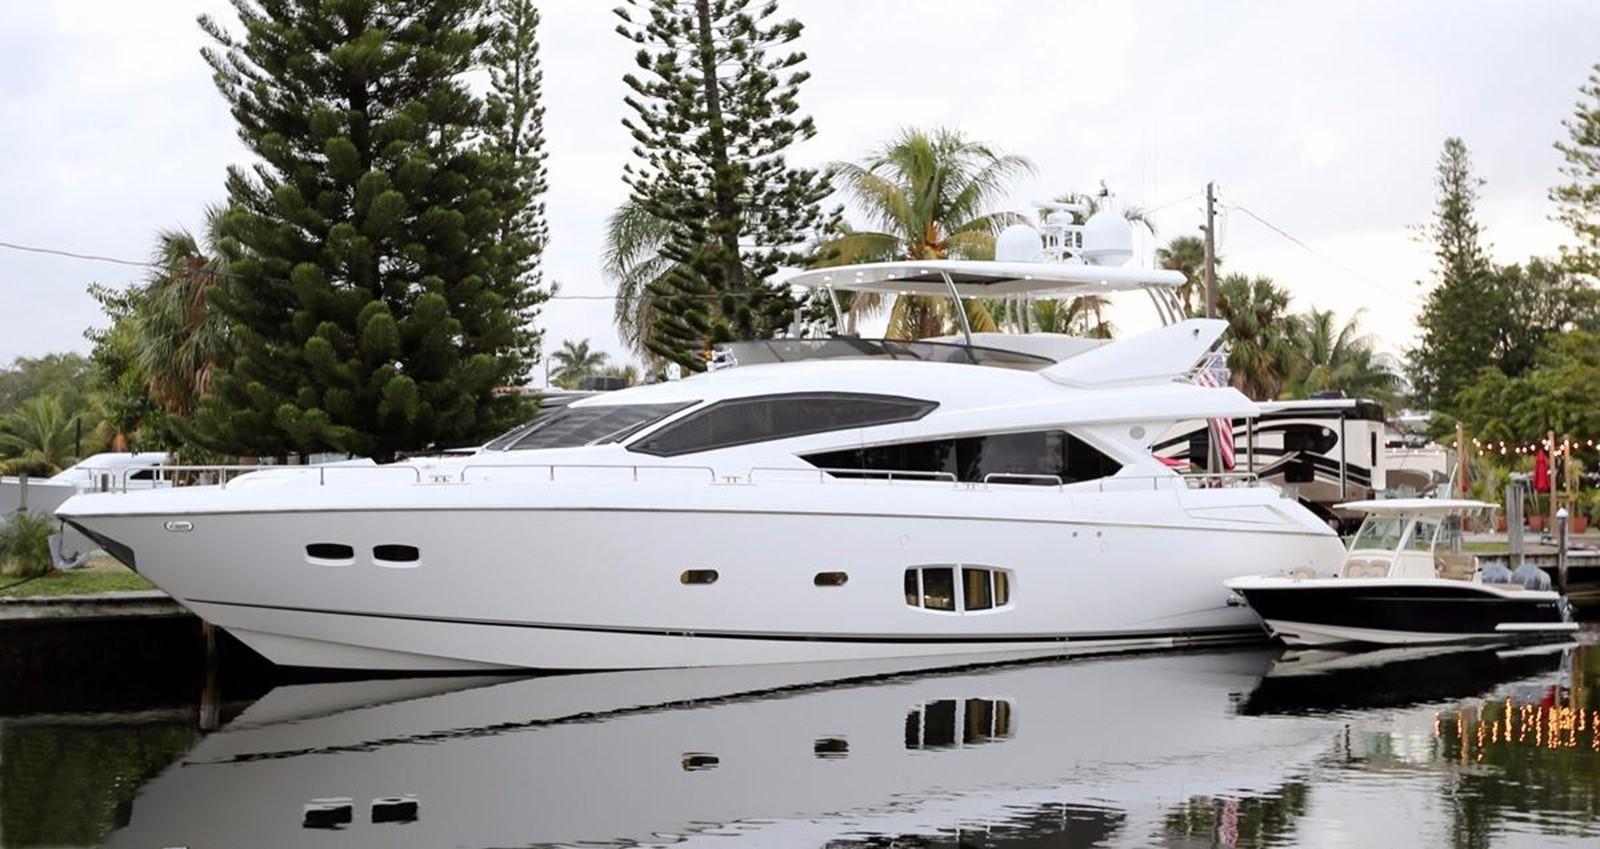 2010 Sunseeker 80 Yacht For Sale